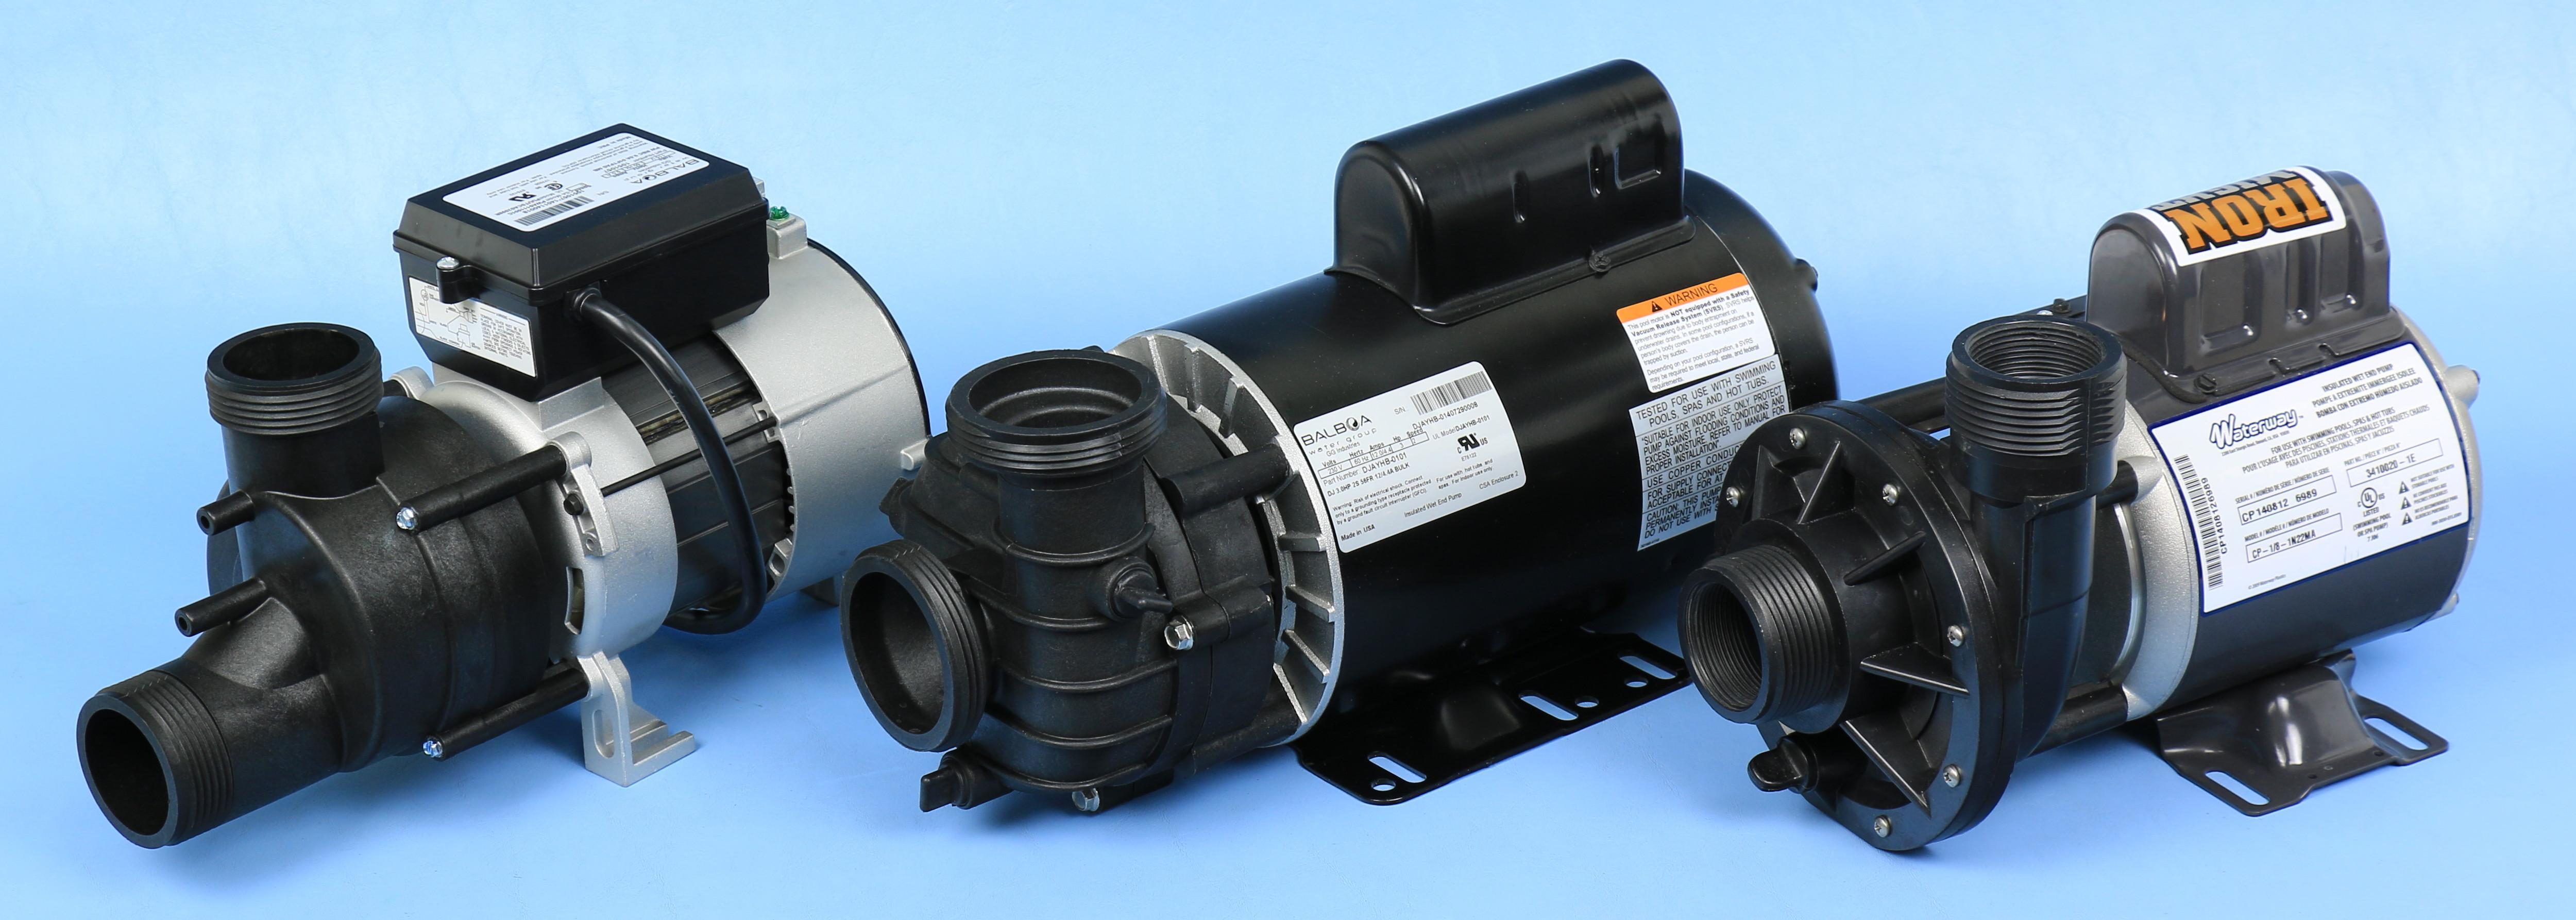 jacuzzi pump wiring diagram 2000 yamaha r6 tail light standard water heater get free image